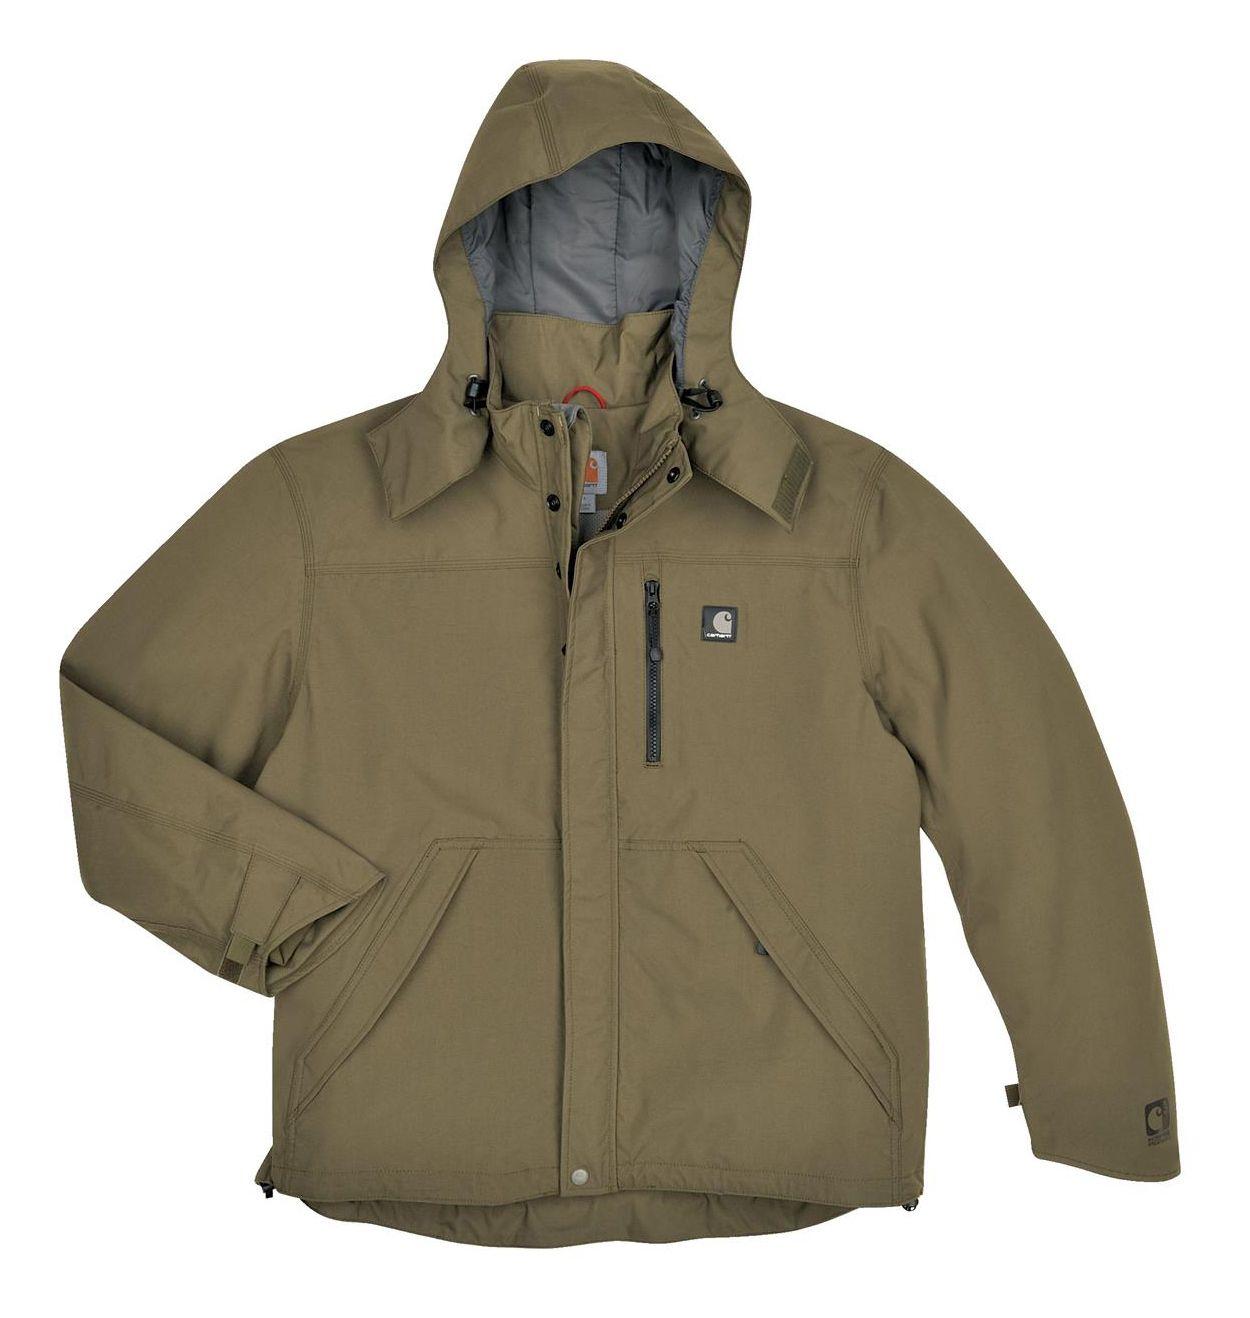 b47638763 Carhartt Shoreline Jacket   Apparel   Green rain jacket, Rain jacket ...